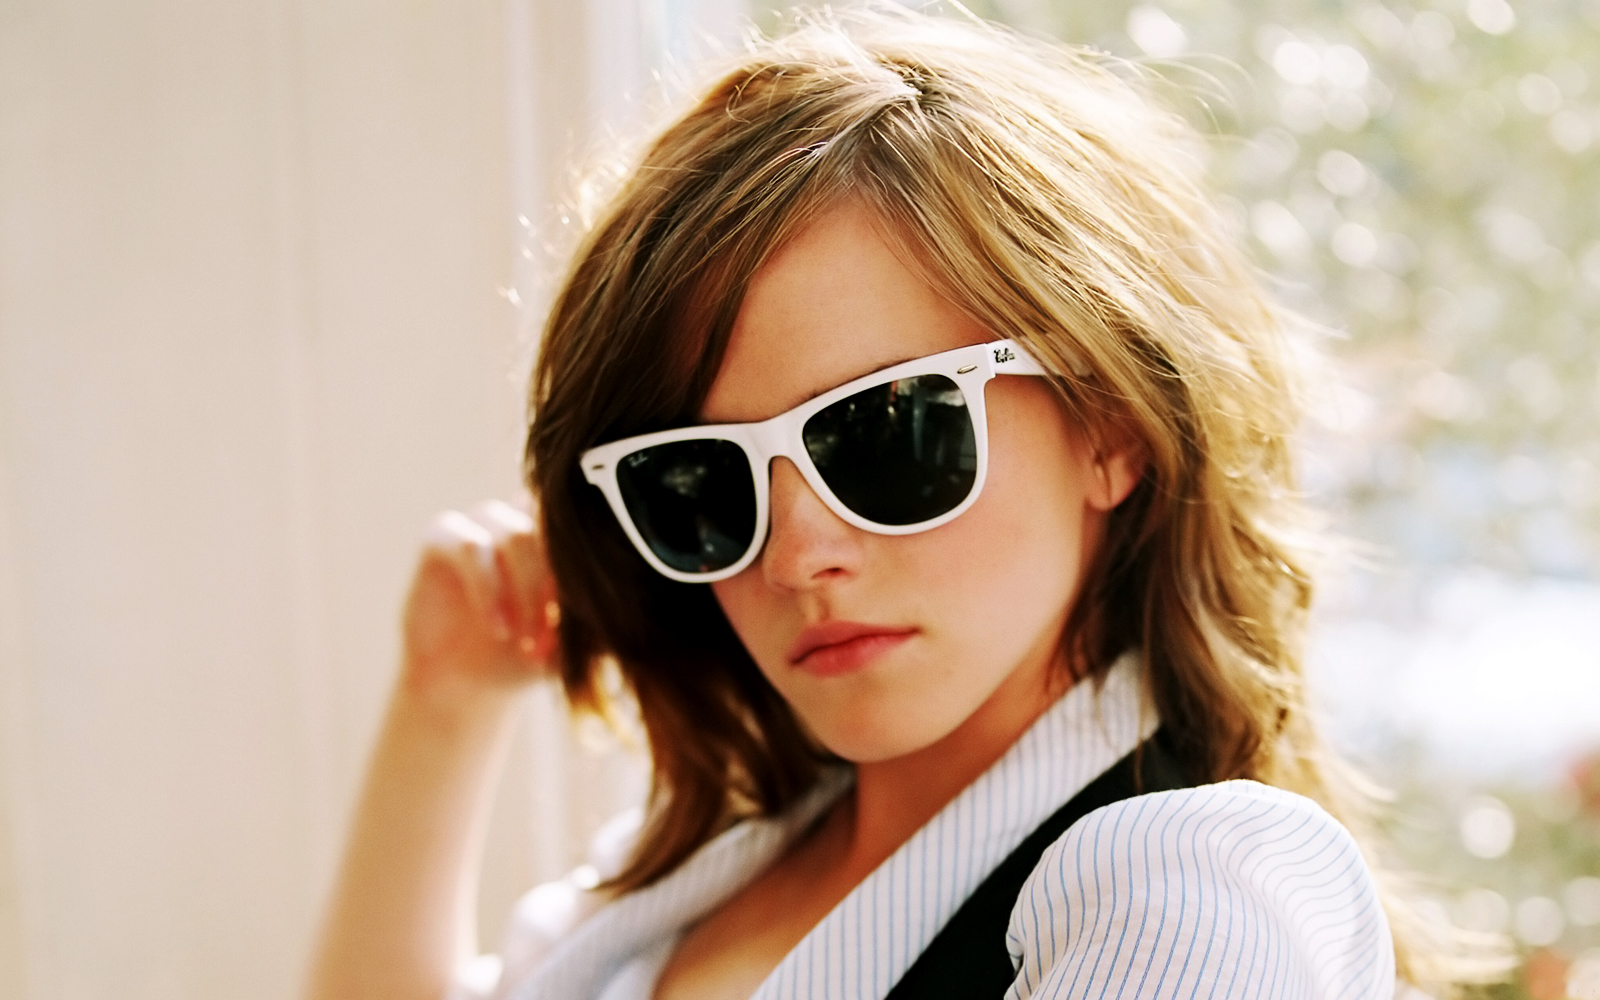 http://4.bp.blogspot.com/-eBPPs1uramo/T31rJqQc61I/AAAAAAAABF8/N6YtWtM4xfA/s1600/Emma_Watson_With_White_Frame_Sunglasses_HD_Wallpaper-Vvallpaper.Net.jpg